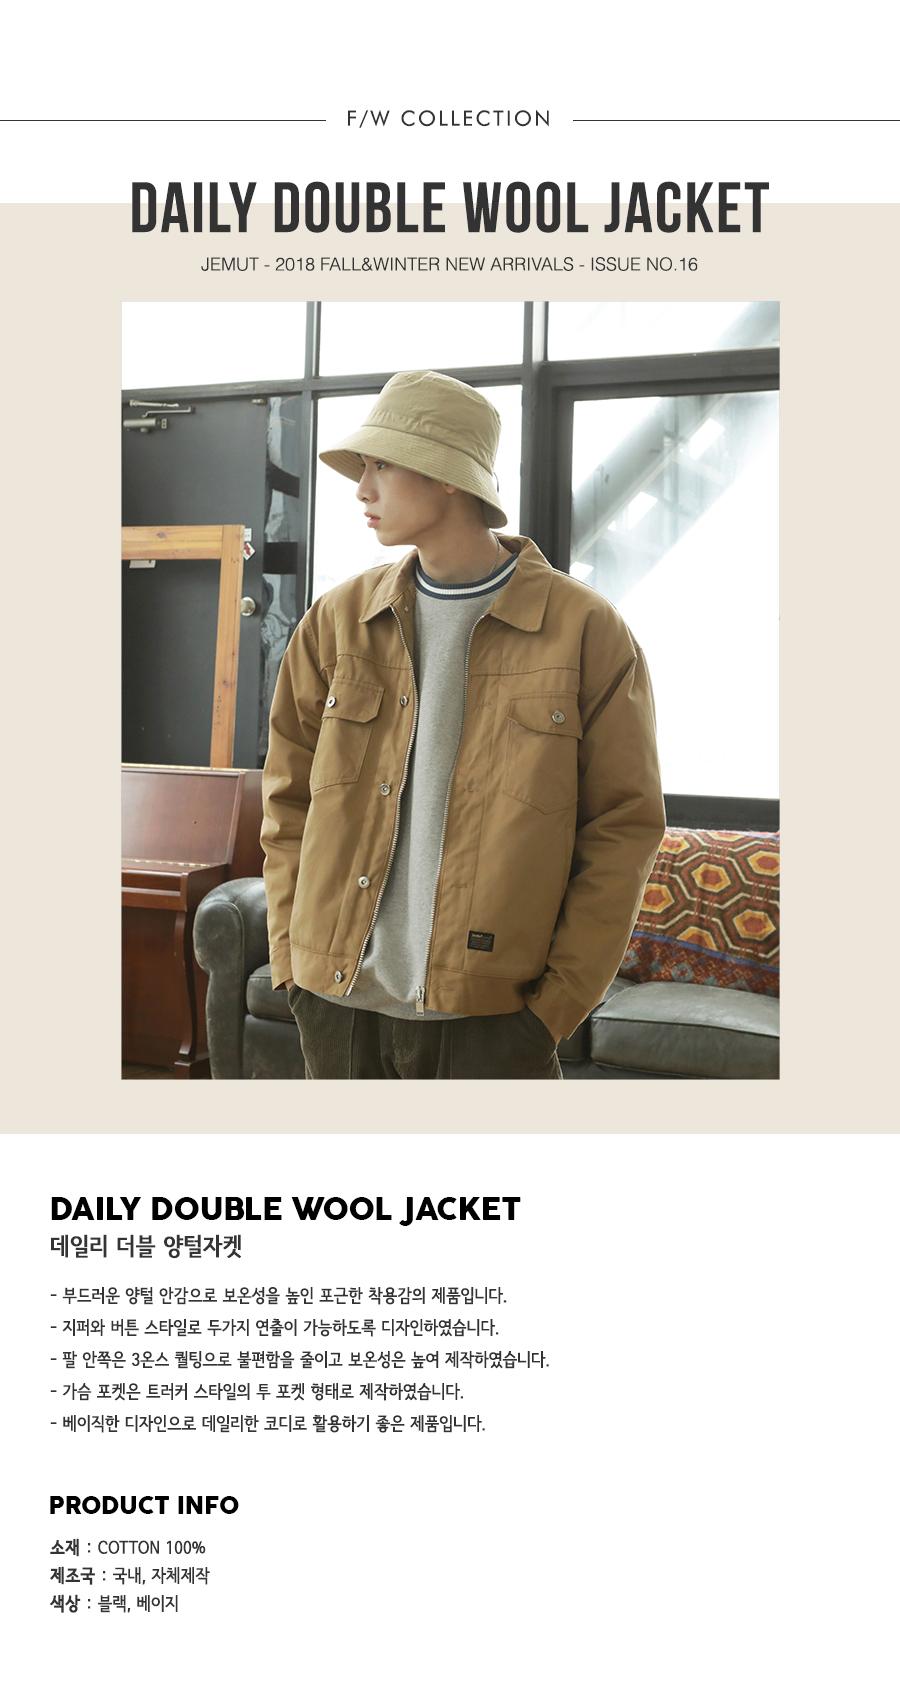 20181005_daily_double_jacket_title_kj.jpg